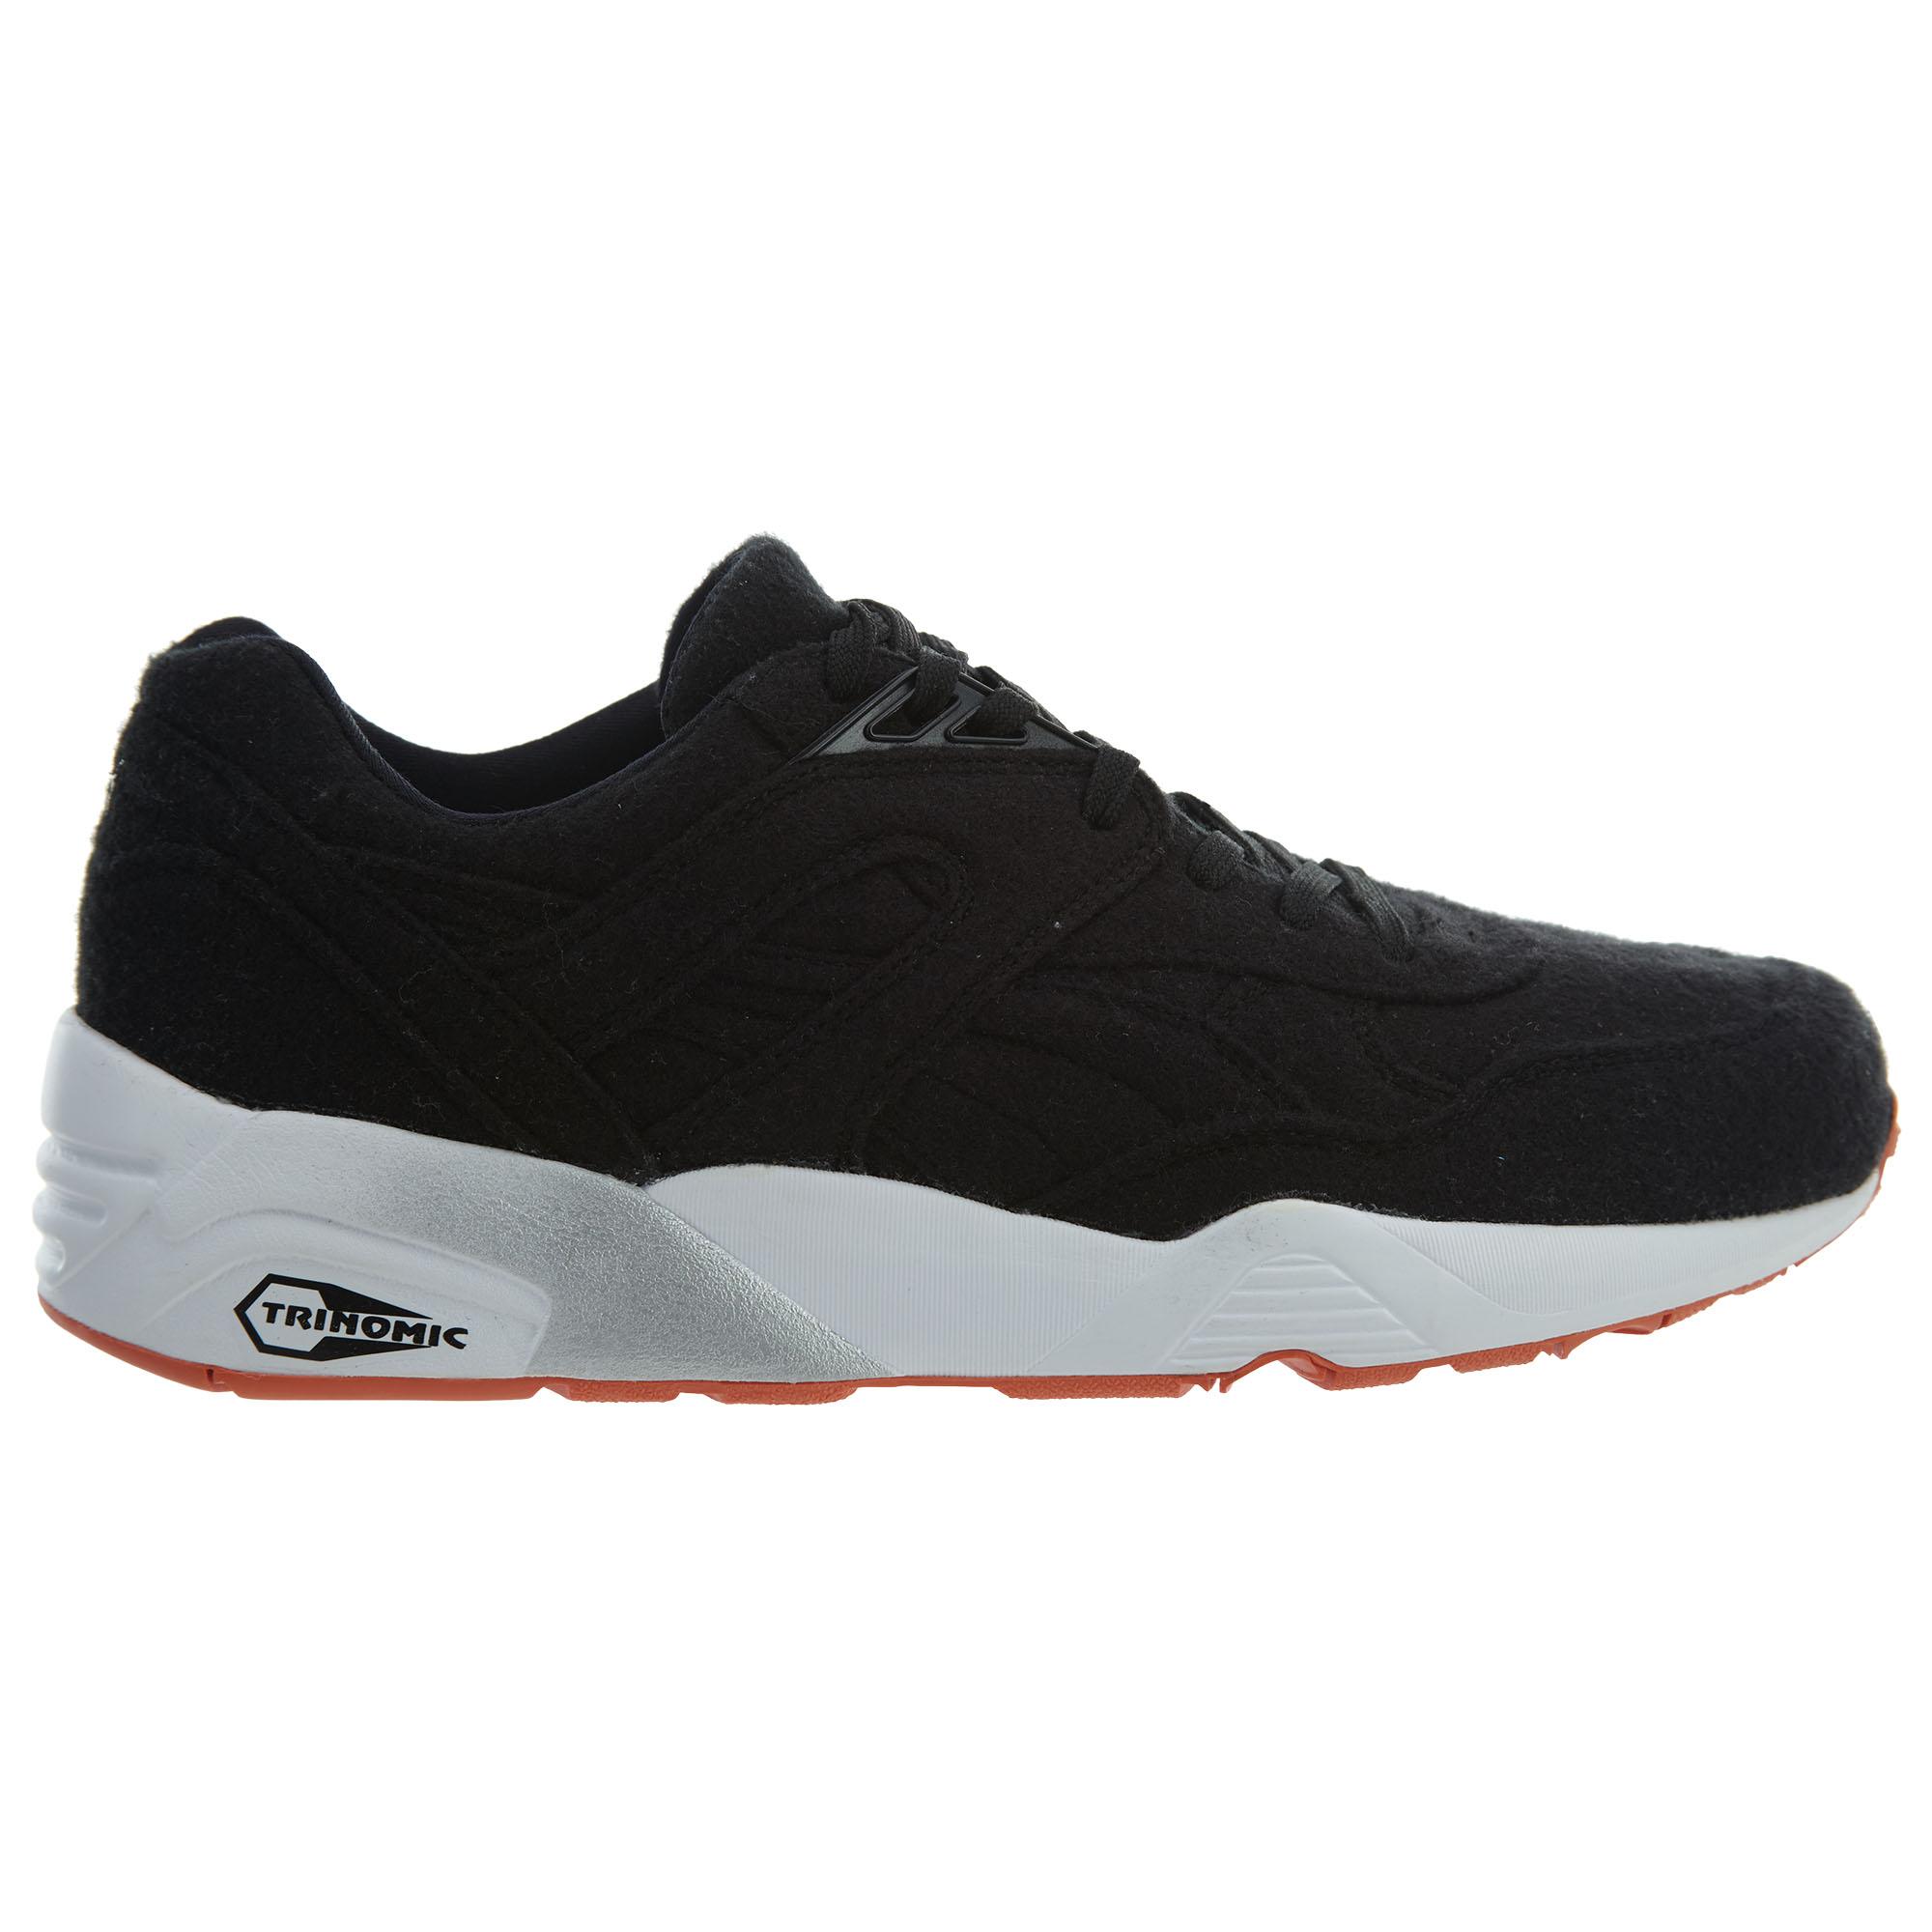 Puma R698 Bright Black - 358832-01